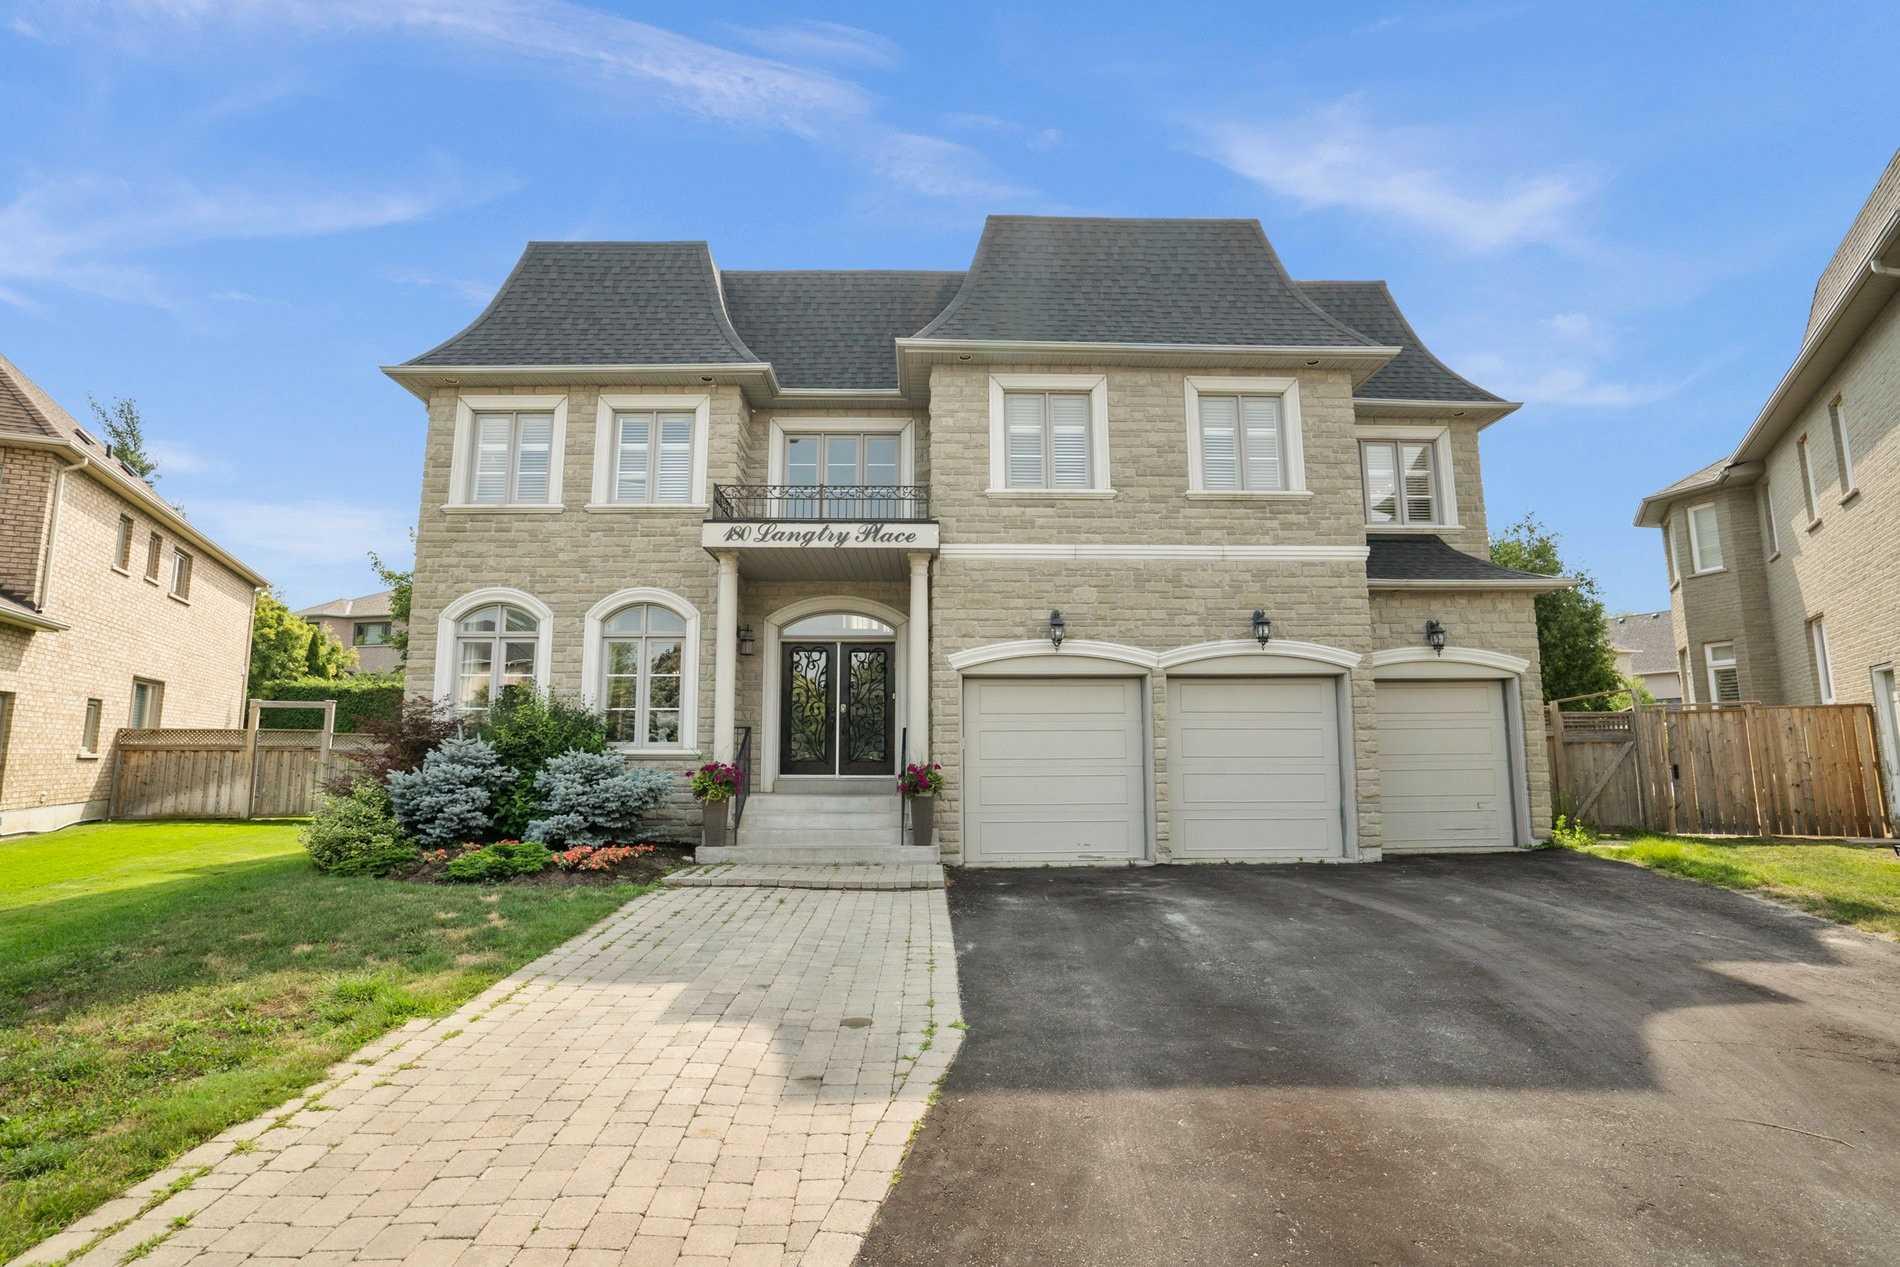 Detached house For Sale In Vaughan - 180 Langtry Pl, Vaughan, Ontario, Canada L4J8L6 , 5 Bedrooms Bedrooms, ,5 BathroomsBathrooms,Detached,For Sale,Langtry